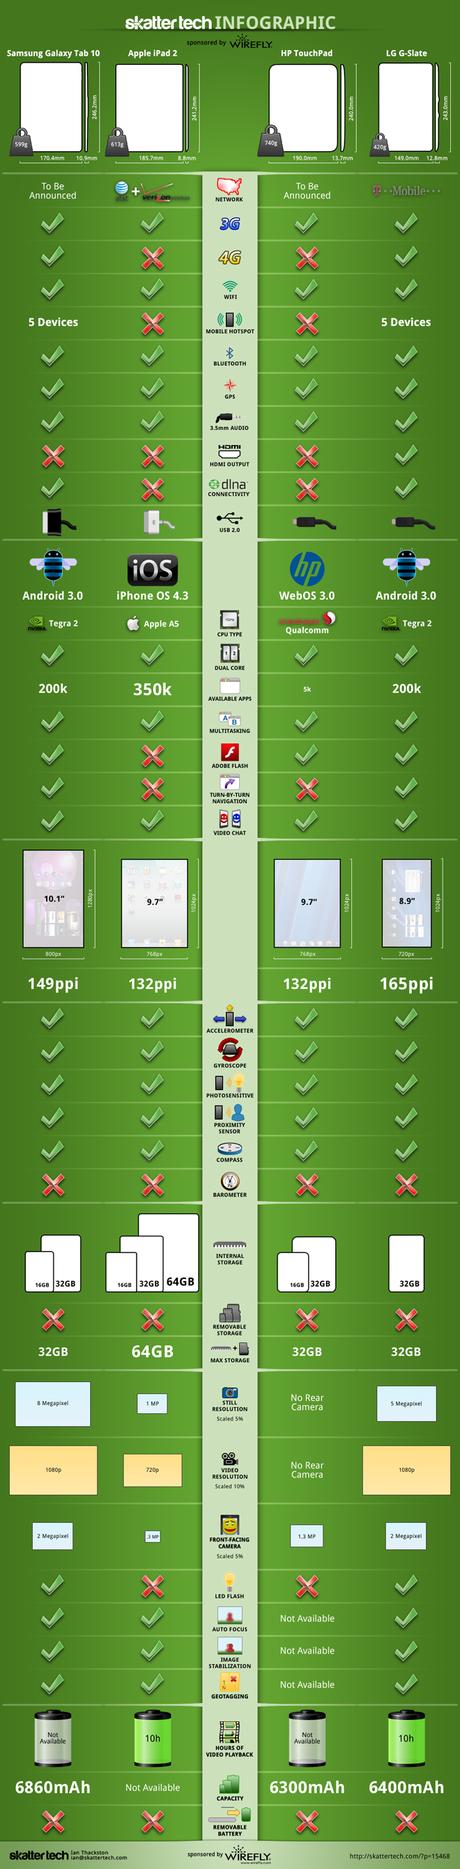 samsung galaxy tab 10 1 apple ipad 2 hp touchpad lg g slate small Quelle tablette choisir ?